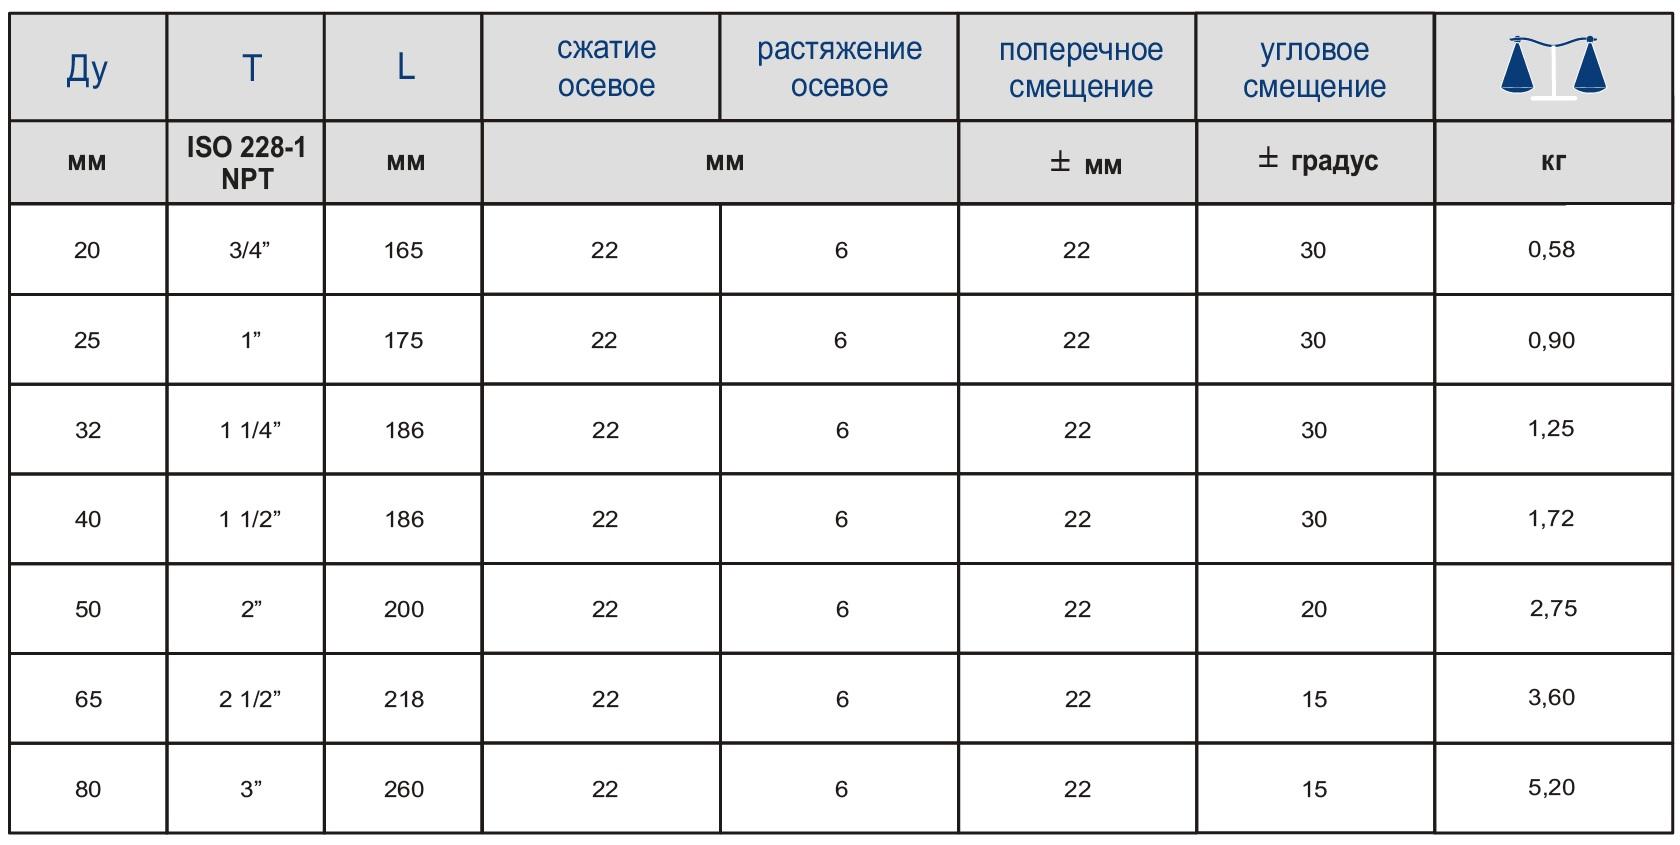 Таблица характеристик для Вибровставка муфтовая Zetkama 701